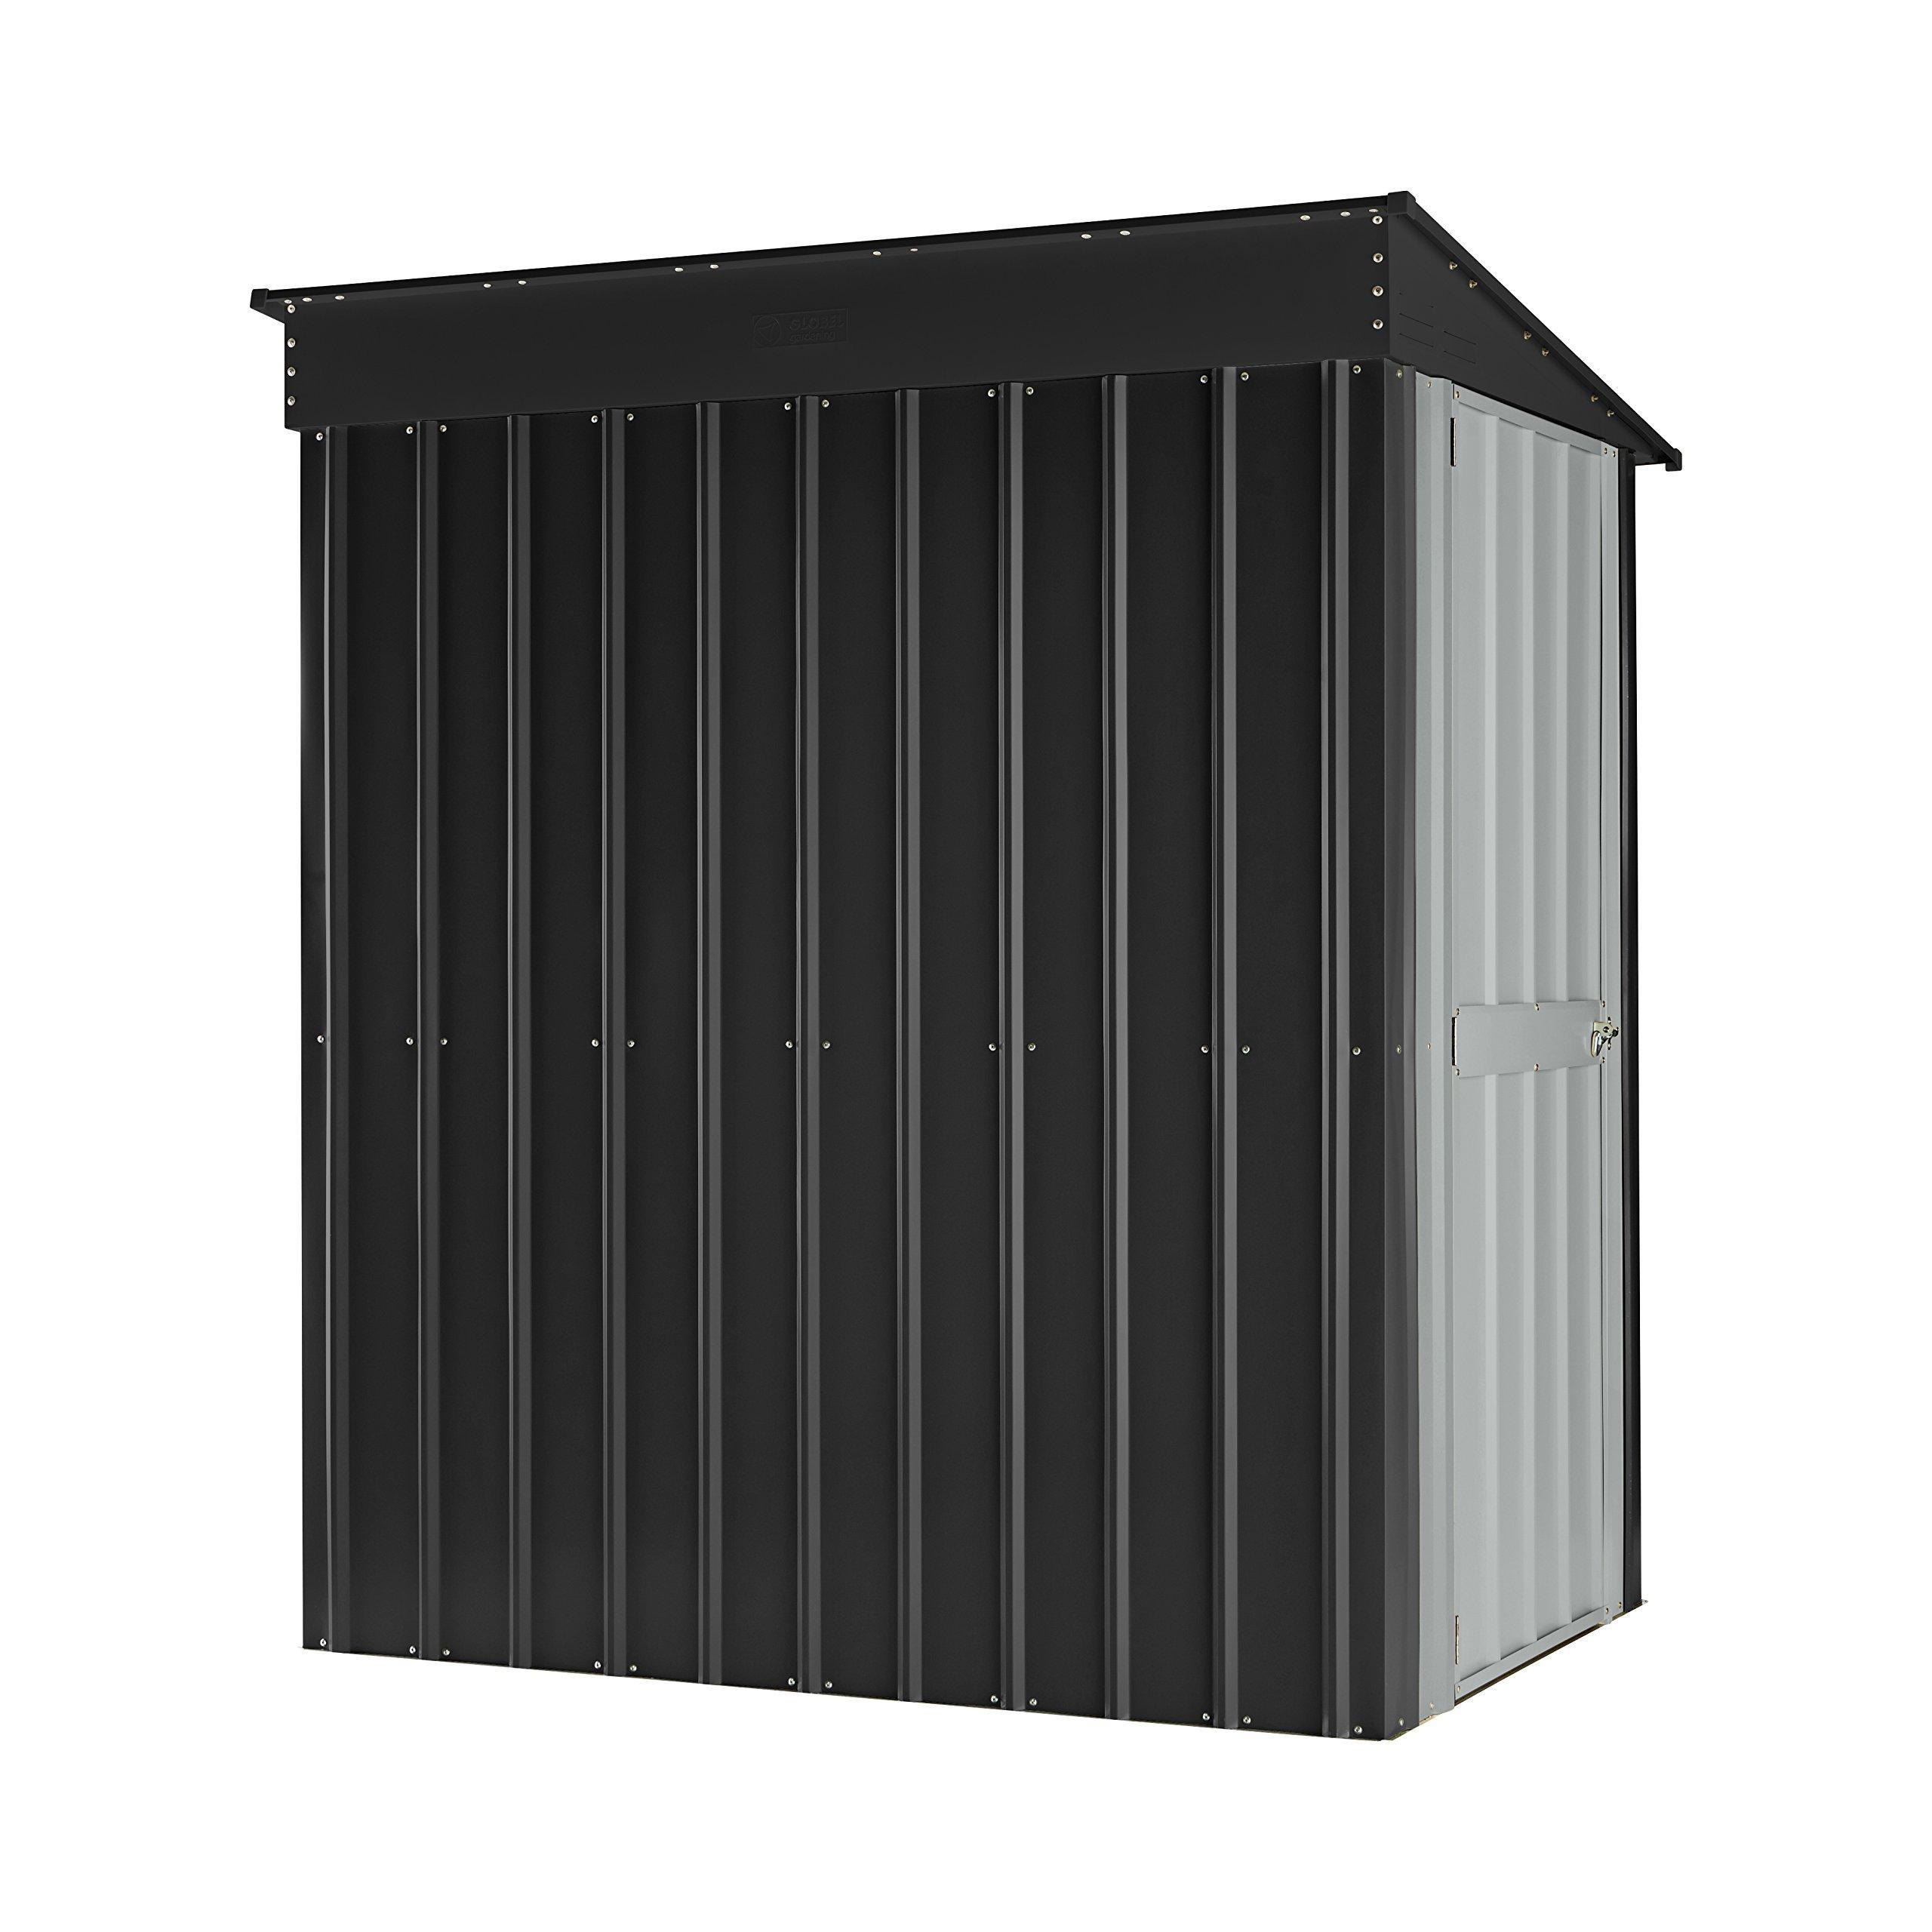 Globel 4x6 Lean-To Steel Storage Shed Slate Grey and Aluminum White by Globel (Image #3)